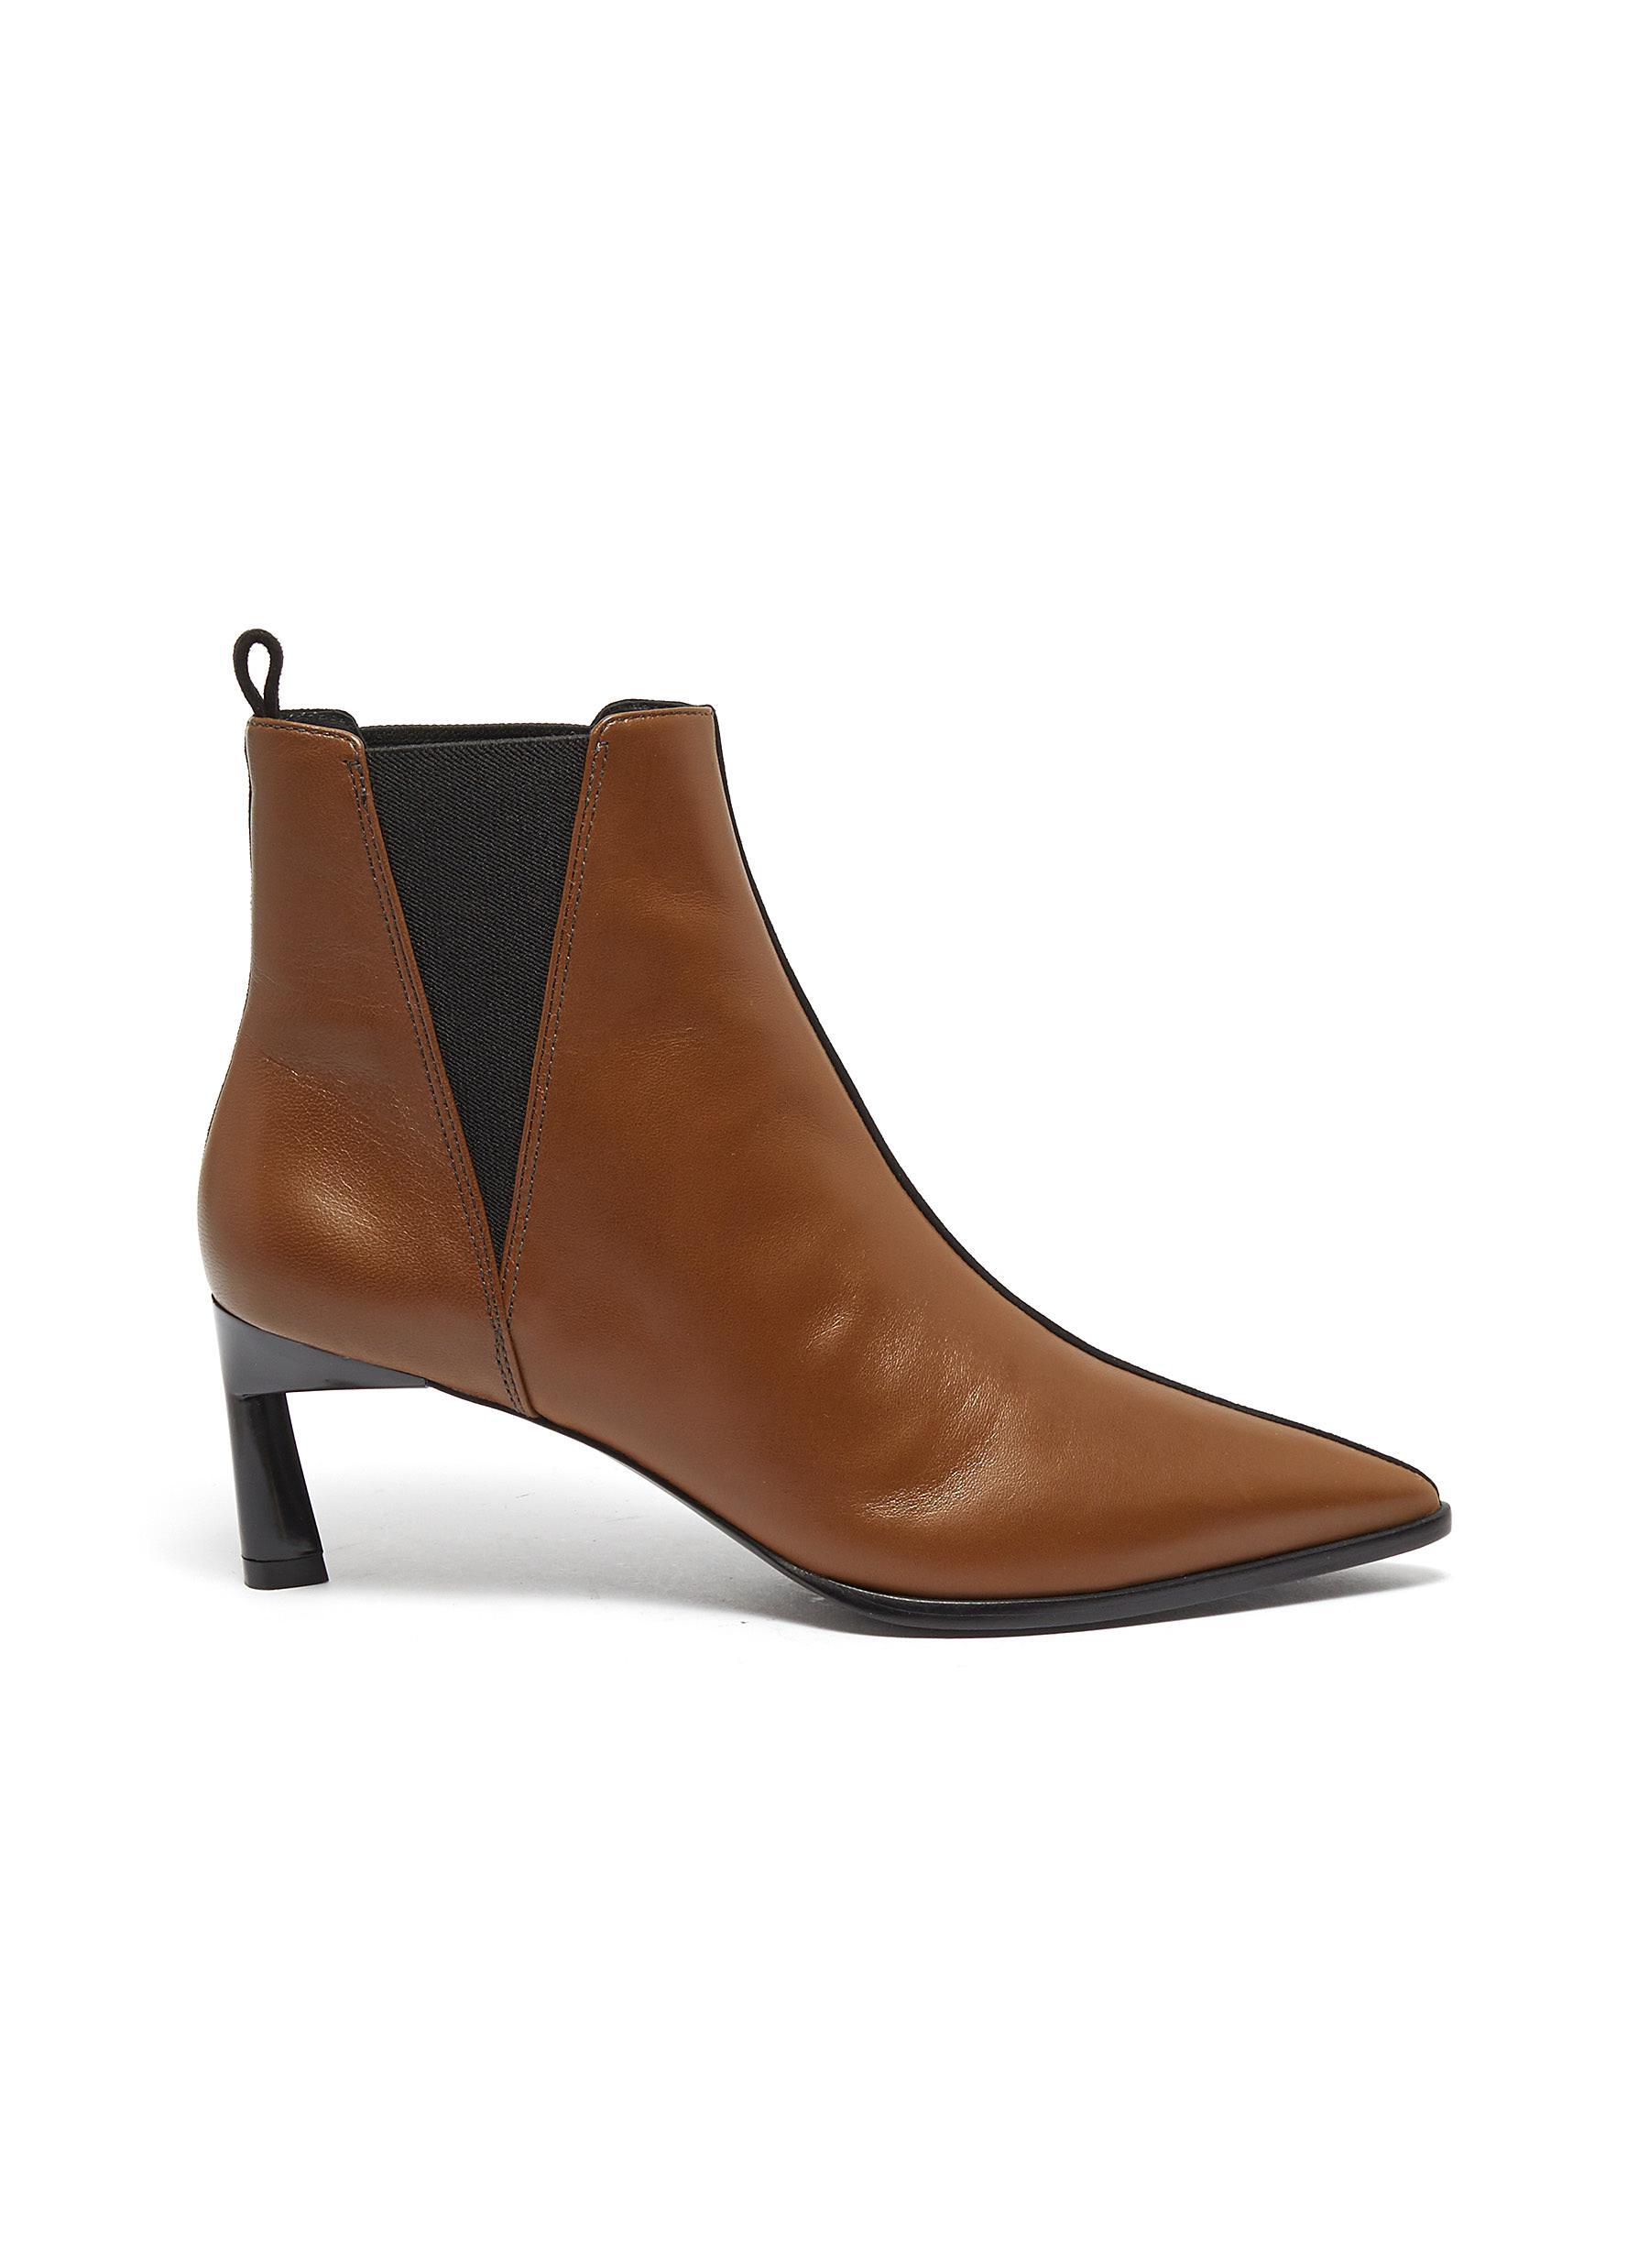 Eletta colourblock suede panel leather Chelsea boots by Mercedes Castillo